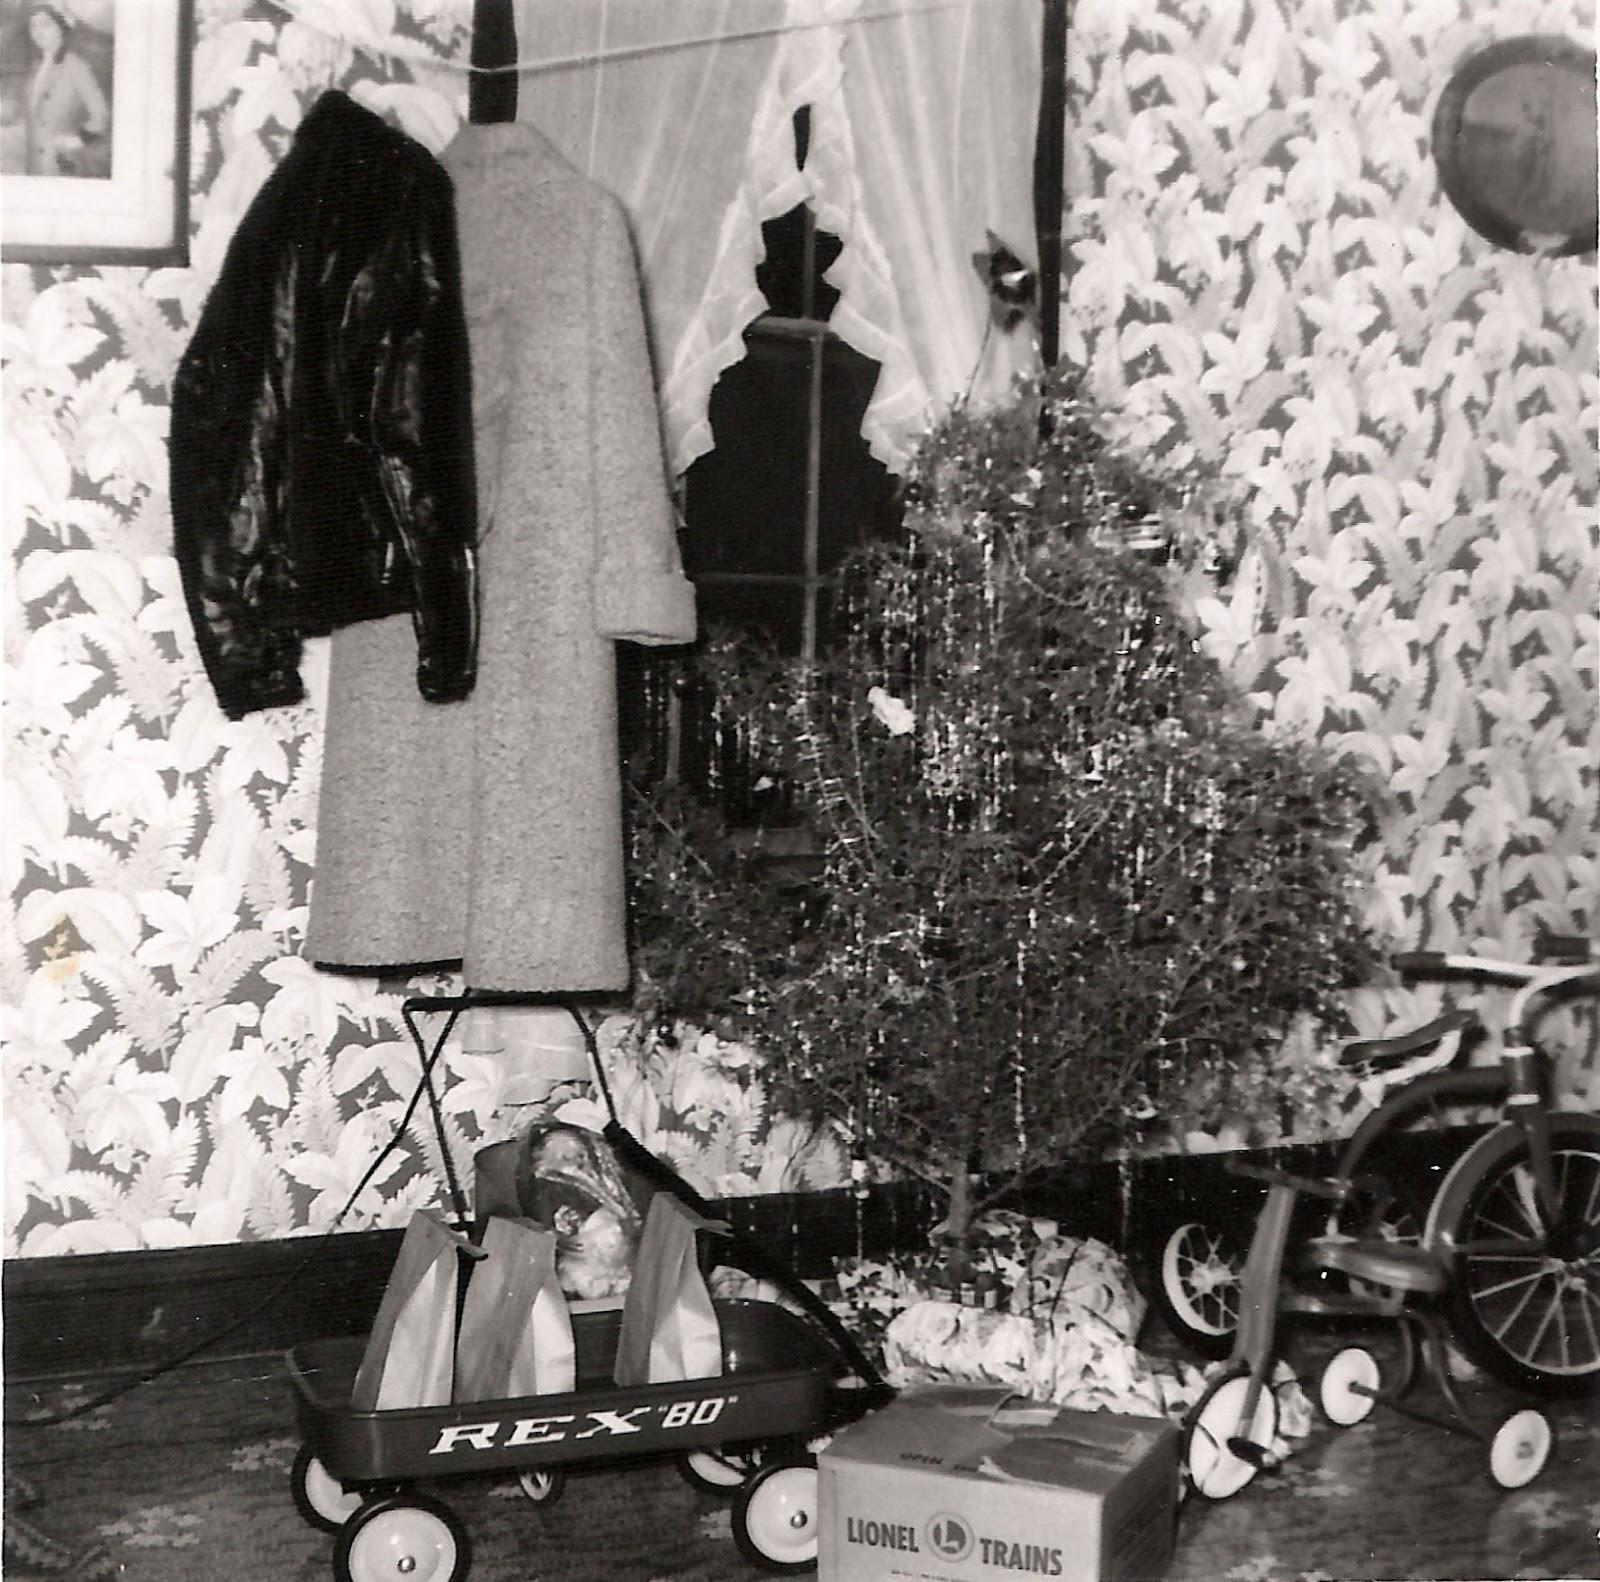 Tate Christmas 913 Ely Street 1957.jpg